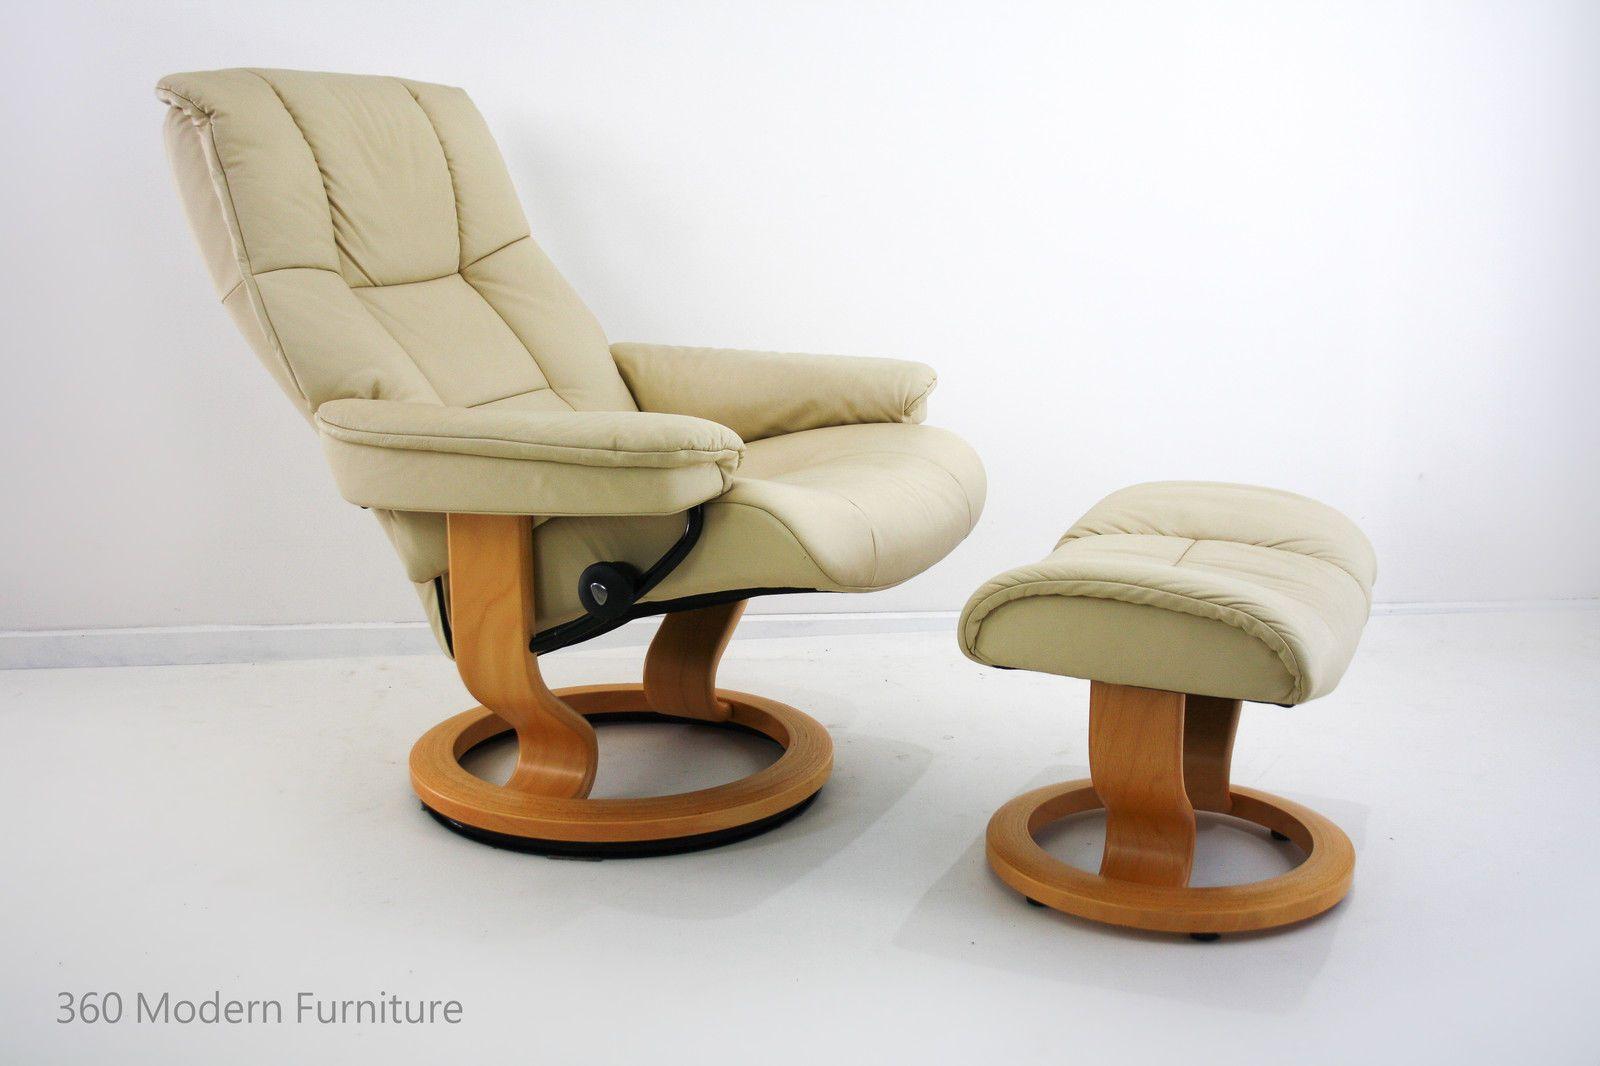 Stressless Ekornes Leather Armchair Recliner Swivel Chair Stool / Ottoman  Scandi | 360 Modern Furniture